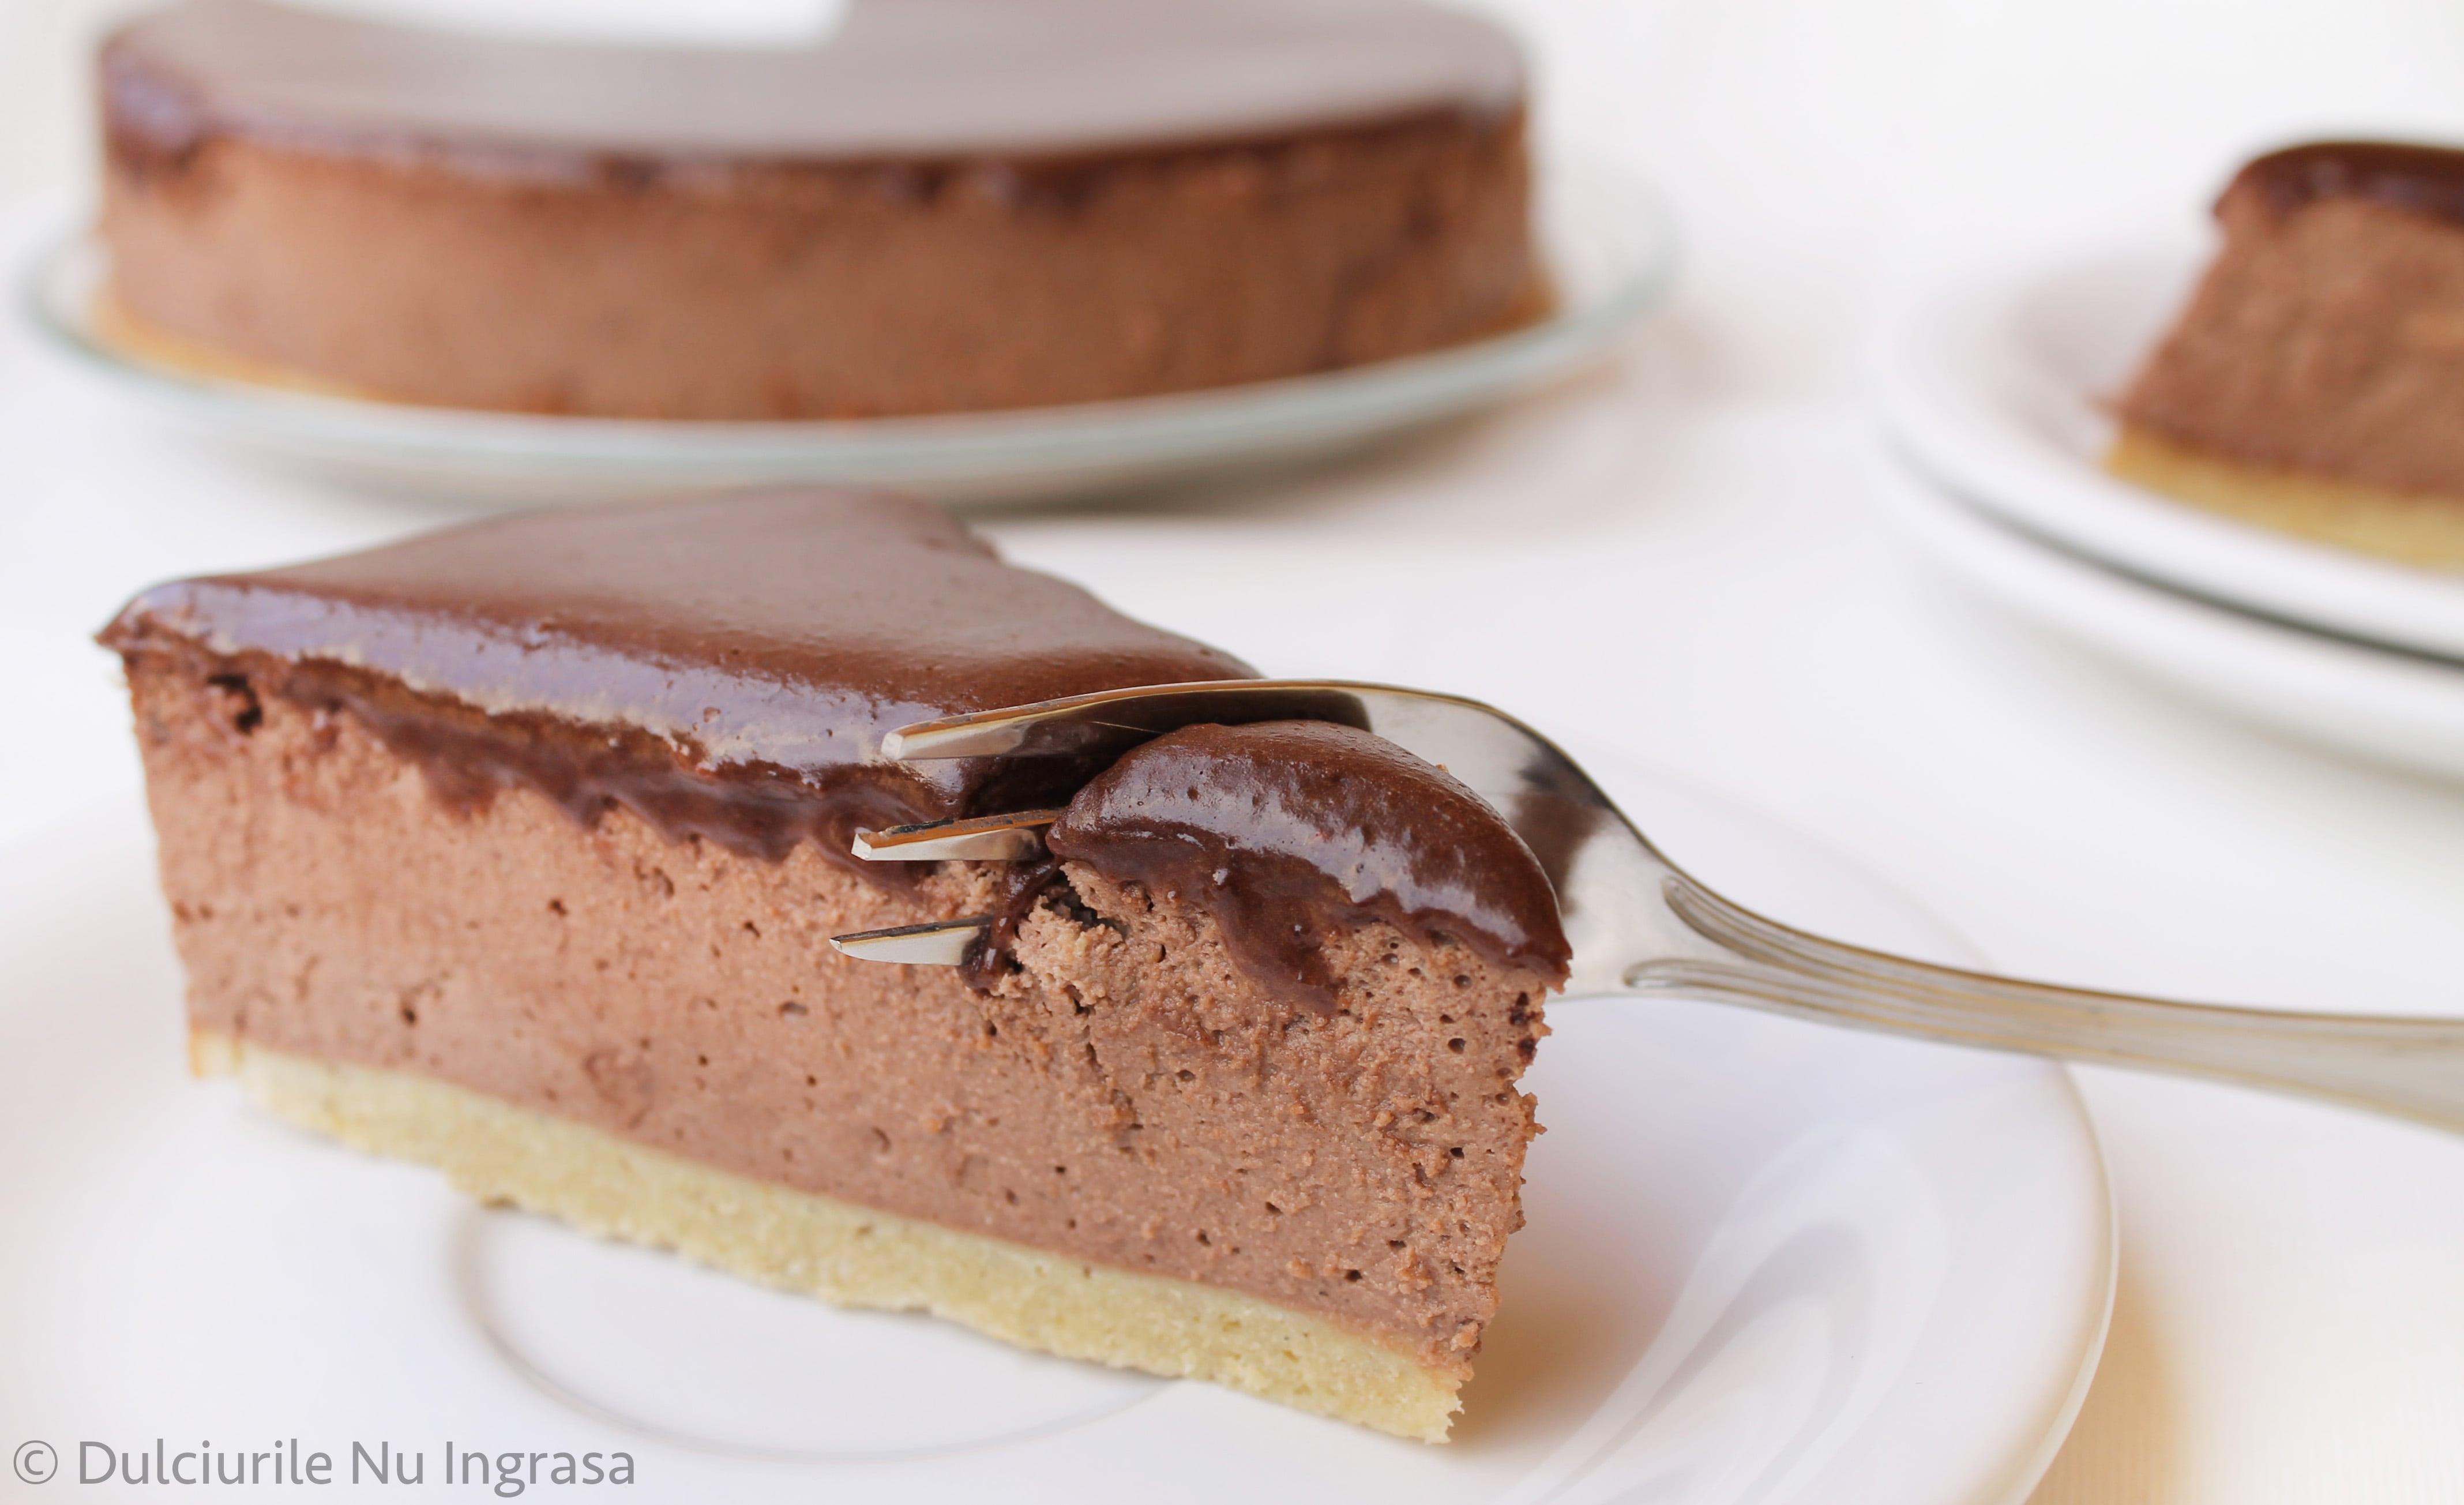 Low Fat Cheesecake Recipe  Protein Chocolate Cheesecake sugar free low fat gluten